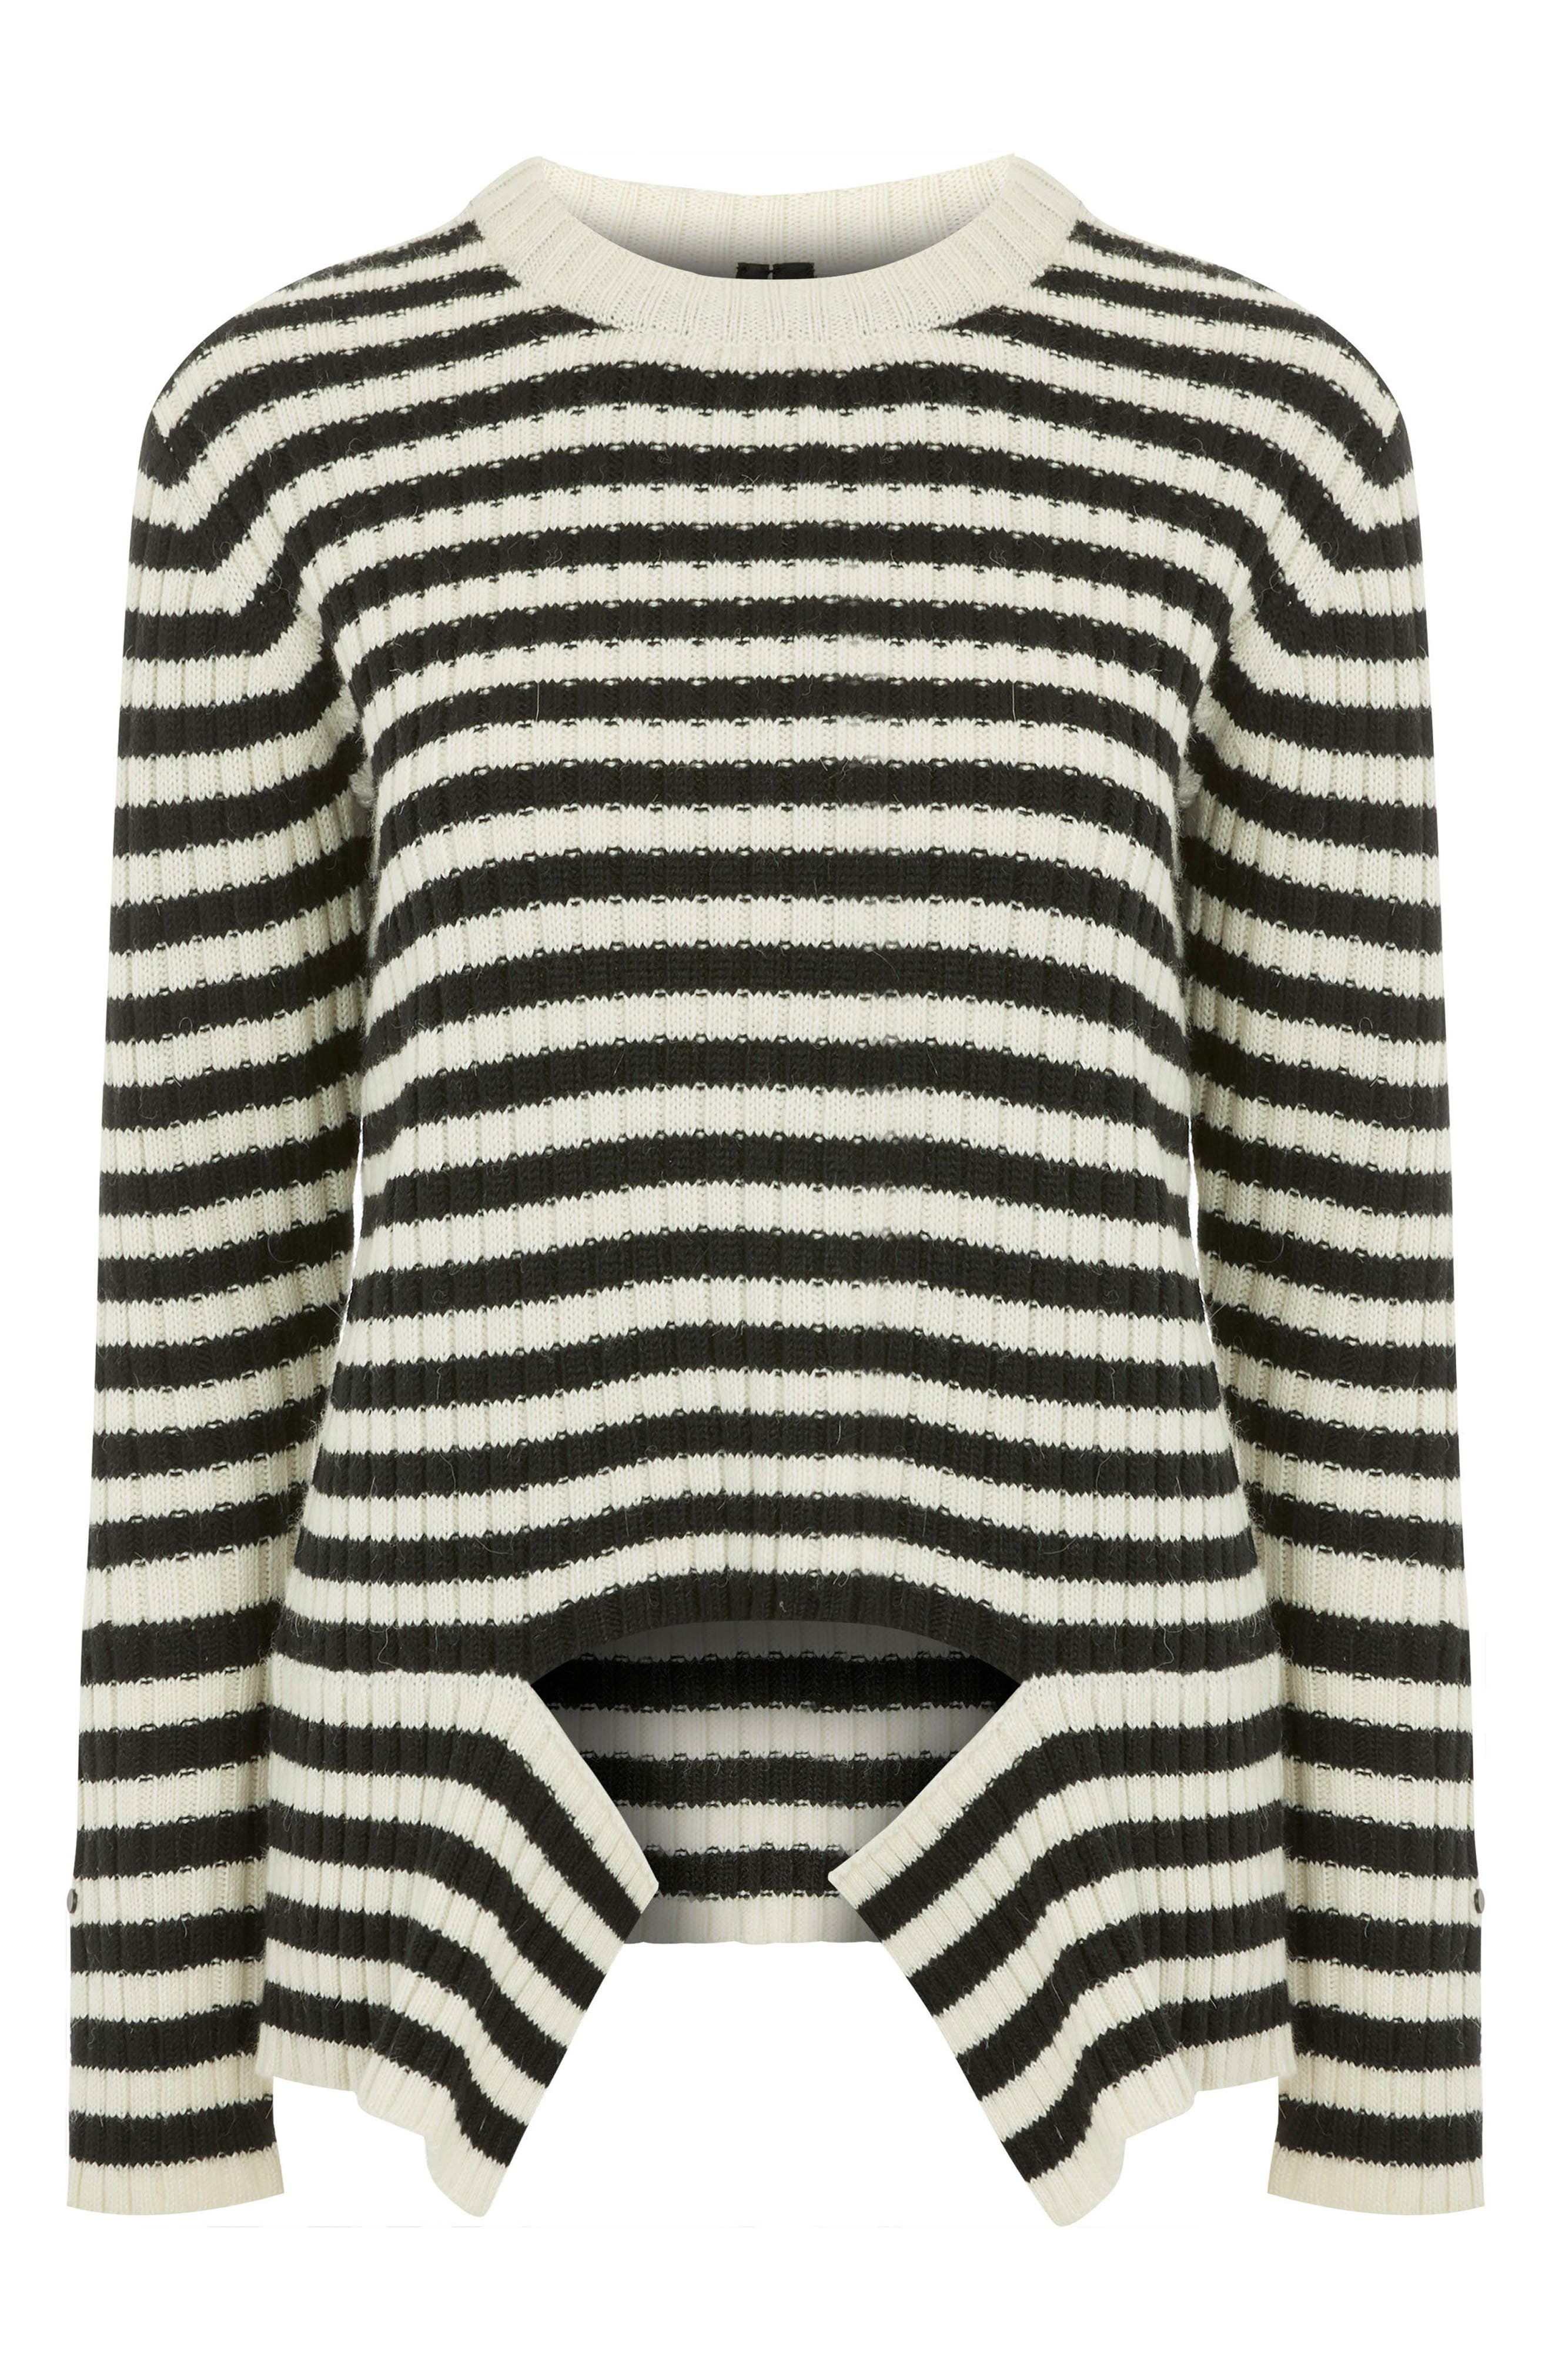 Topshop Boutique Stripe Sweater